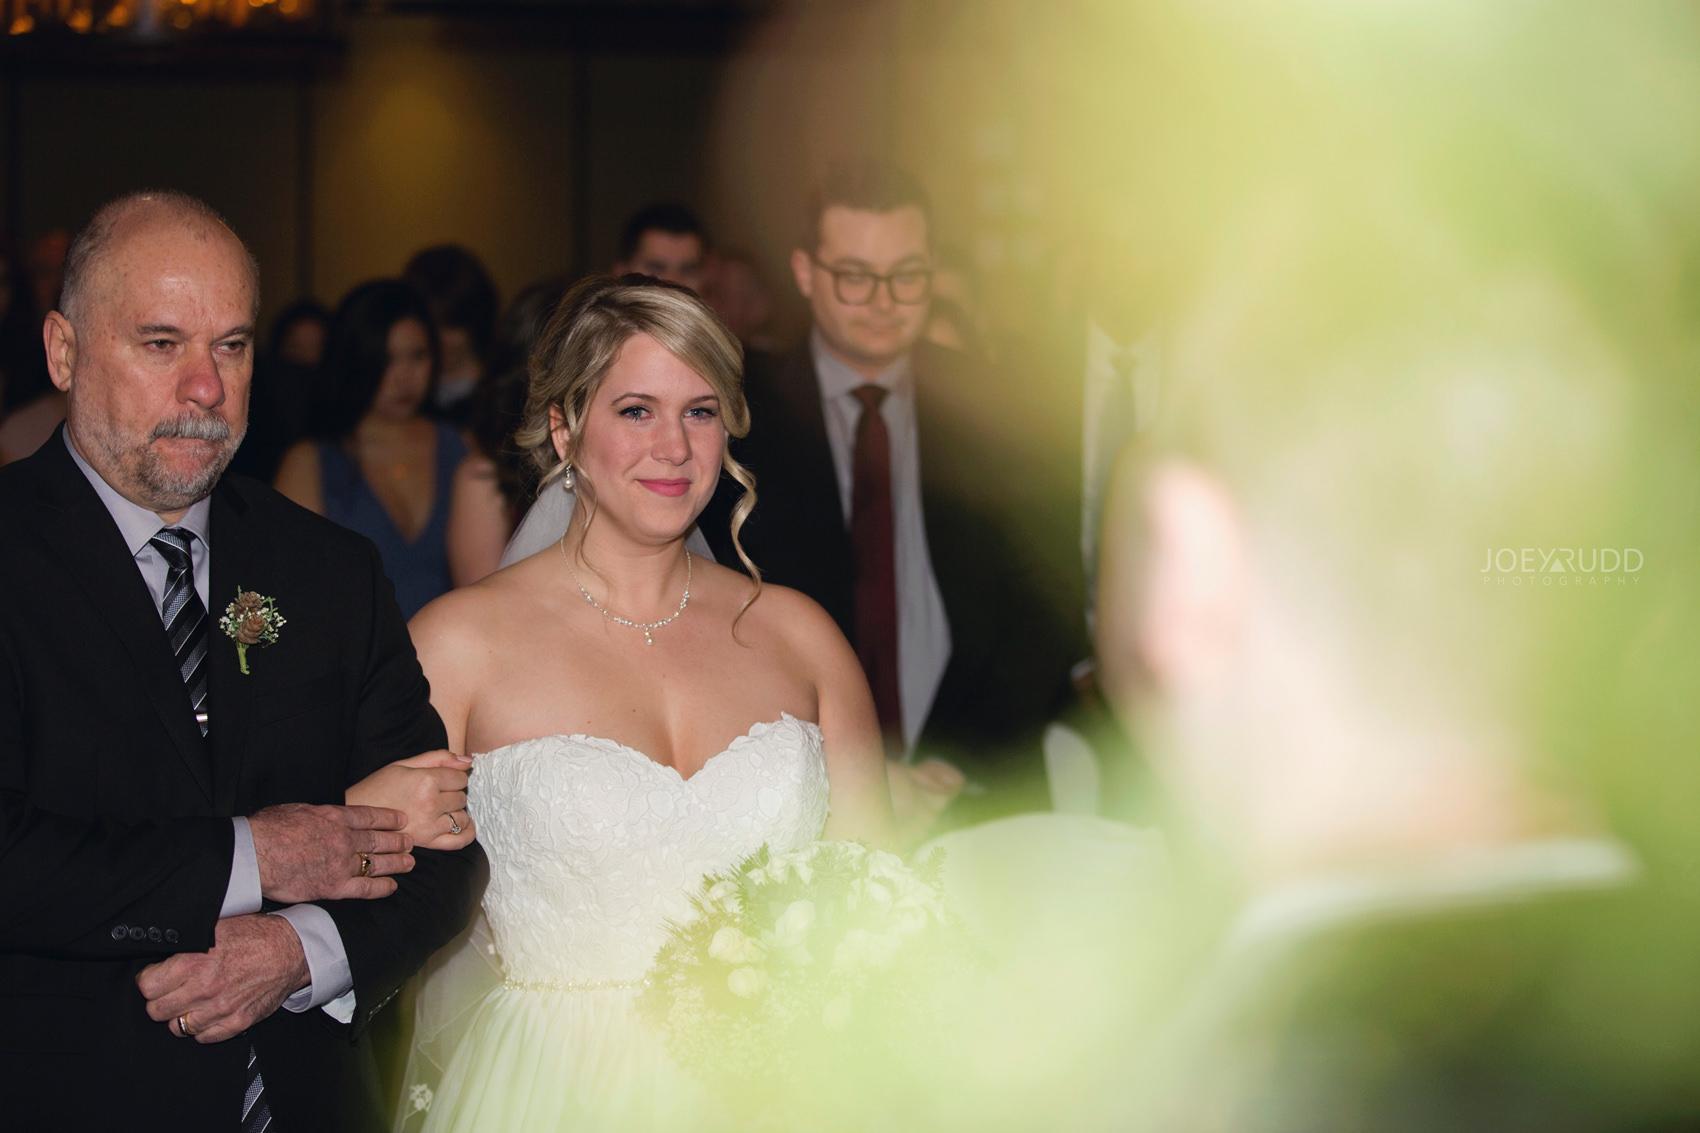 Winter Wedding in Ottawa at Greyhawk Golf Club by Ottawa Wedding Photographer Joey Rudd Photography Ceremony